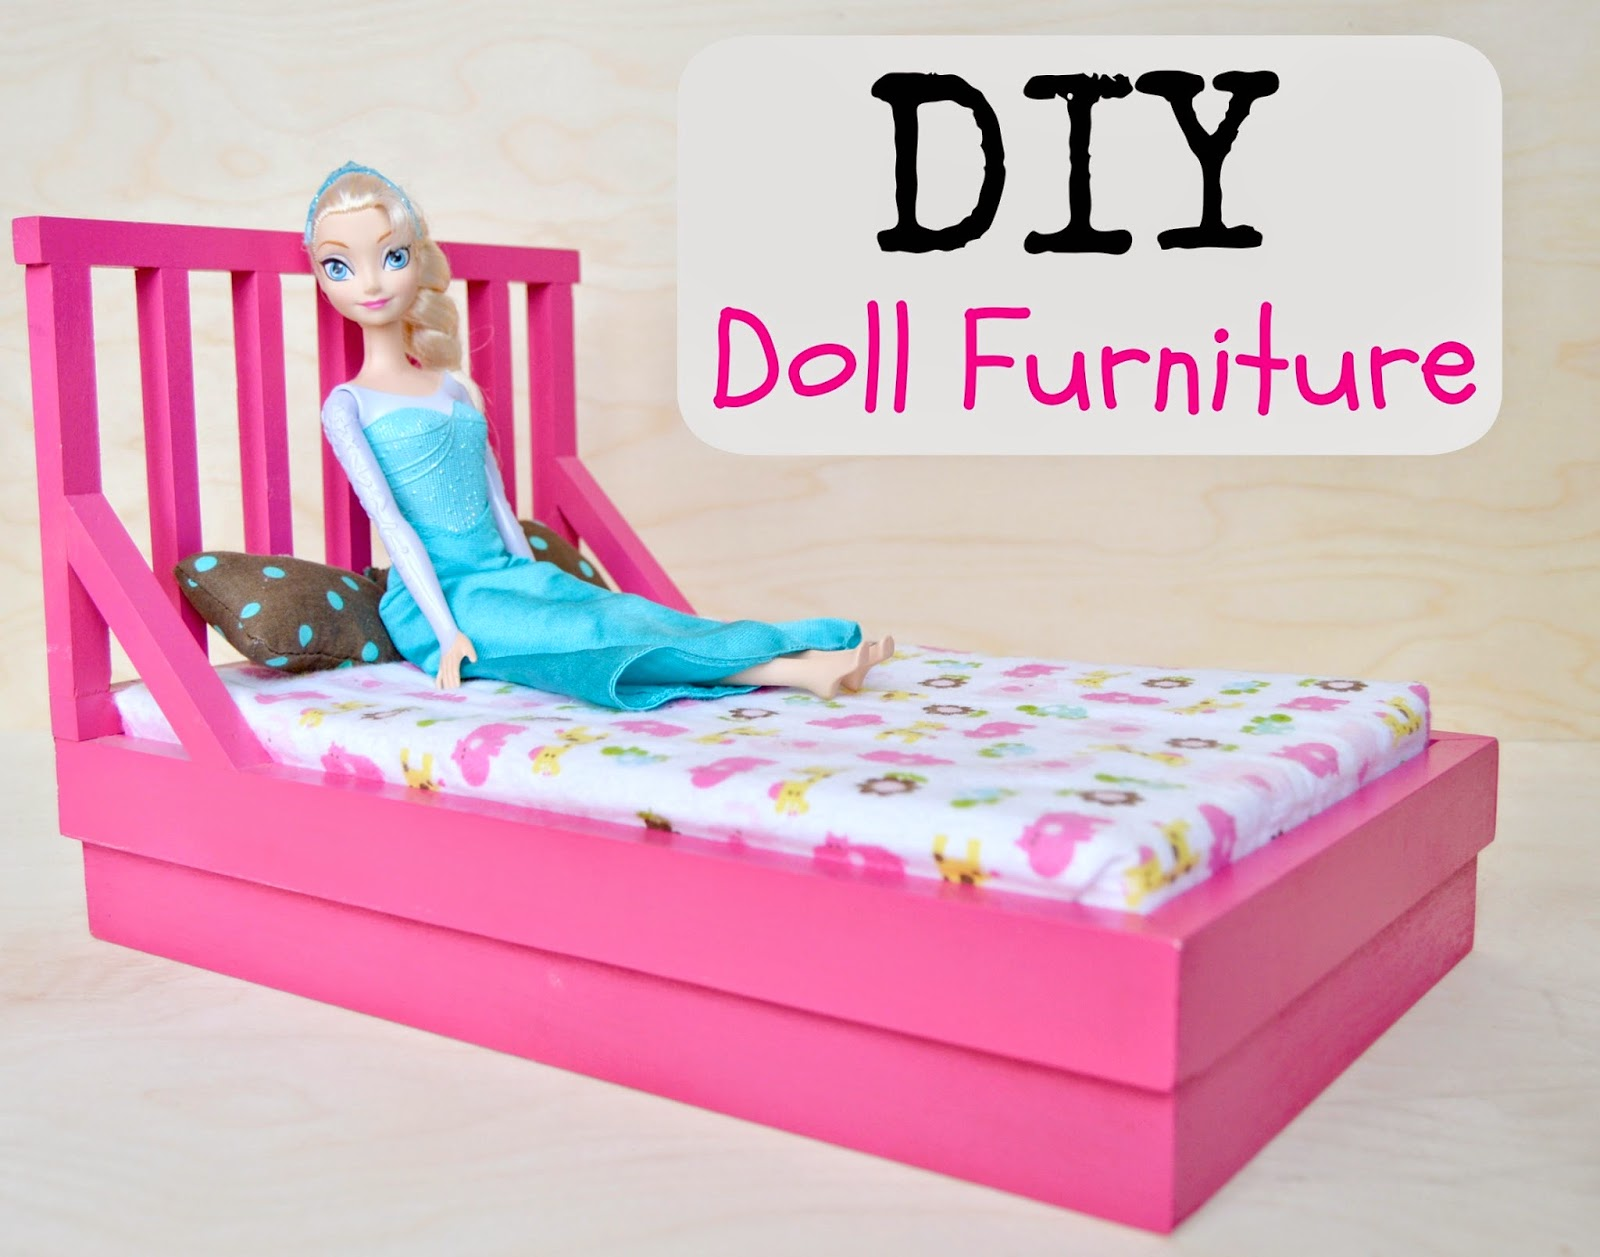 KRUSE'S WORKSHOP: DIY Dollhouse Furniture